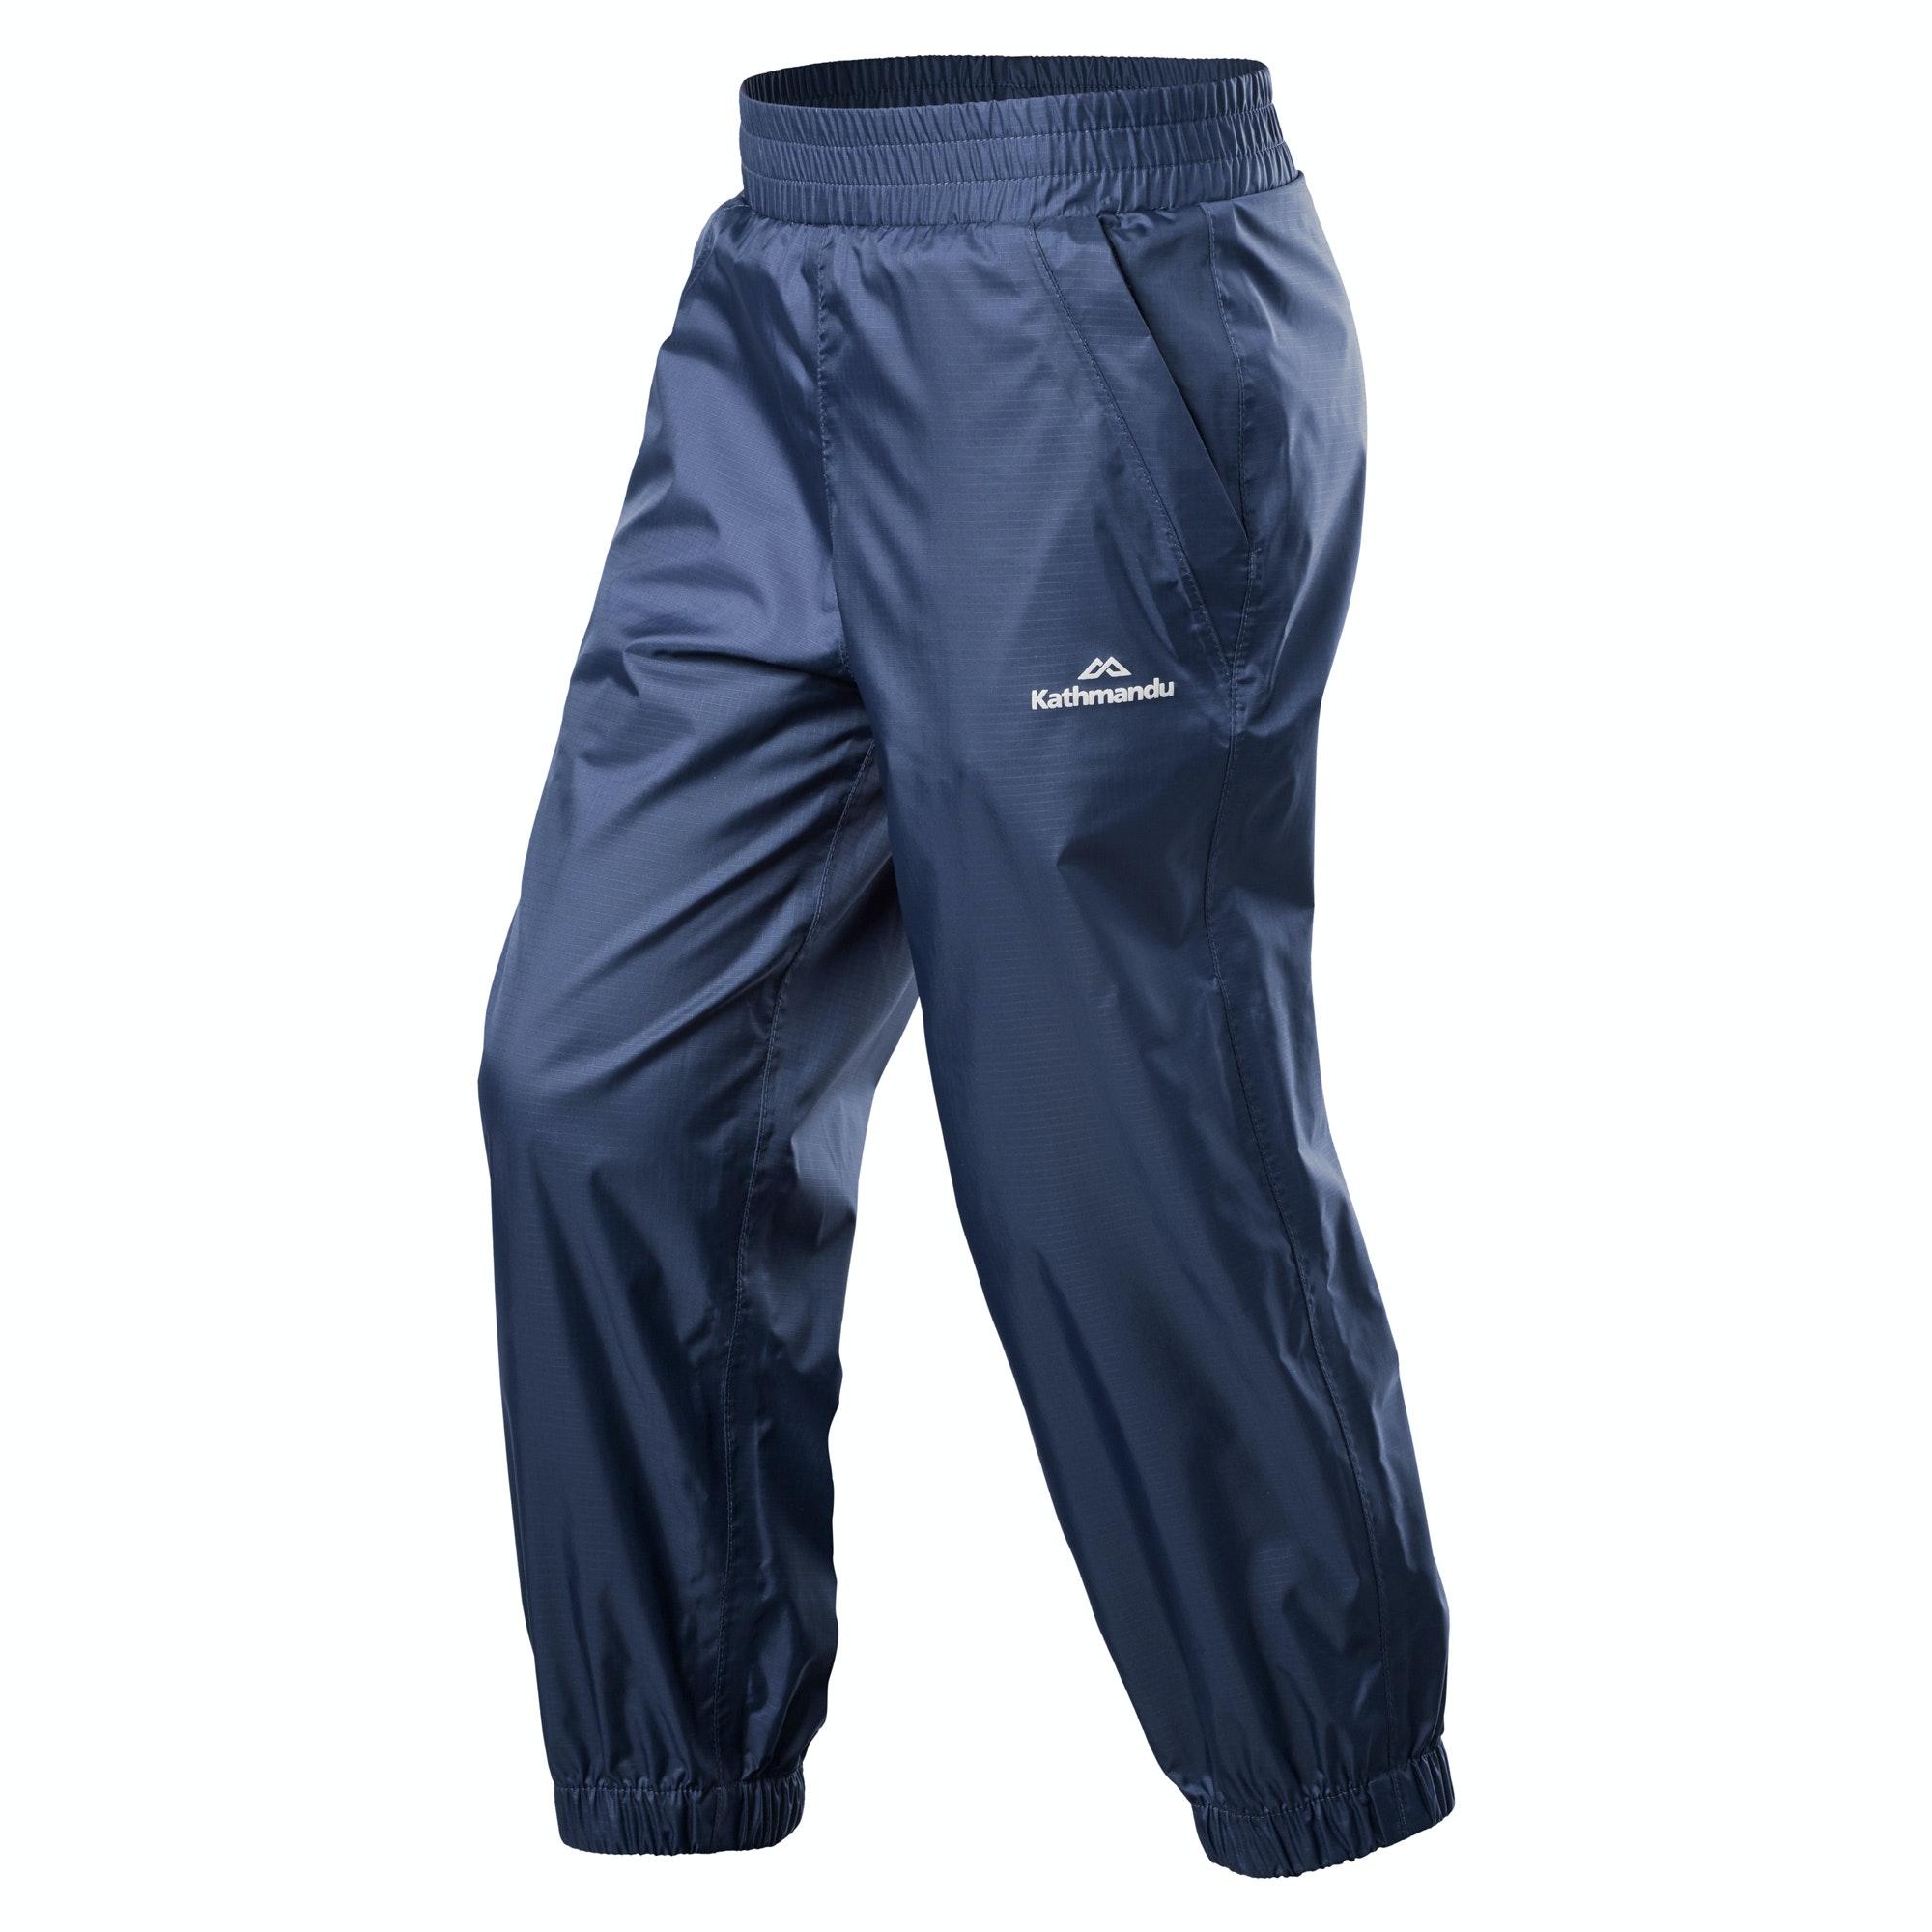 1ab44cbe1 Kathmandu Pocket-it Kids Girls Boys Durable Water Resistant Pants ...